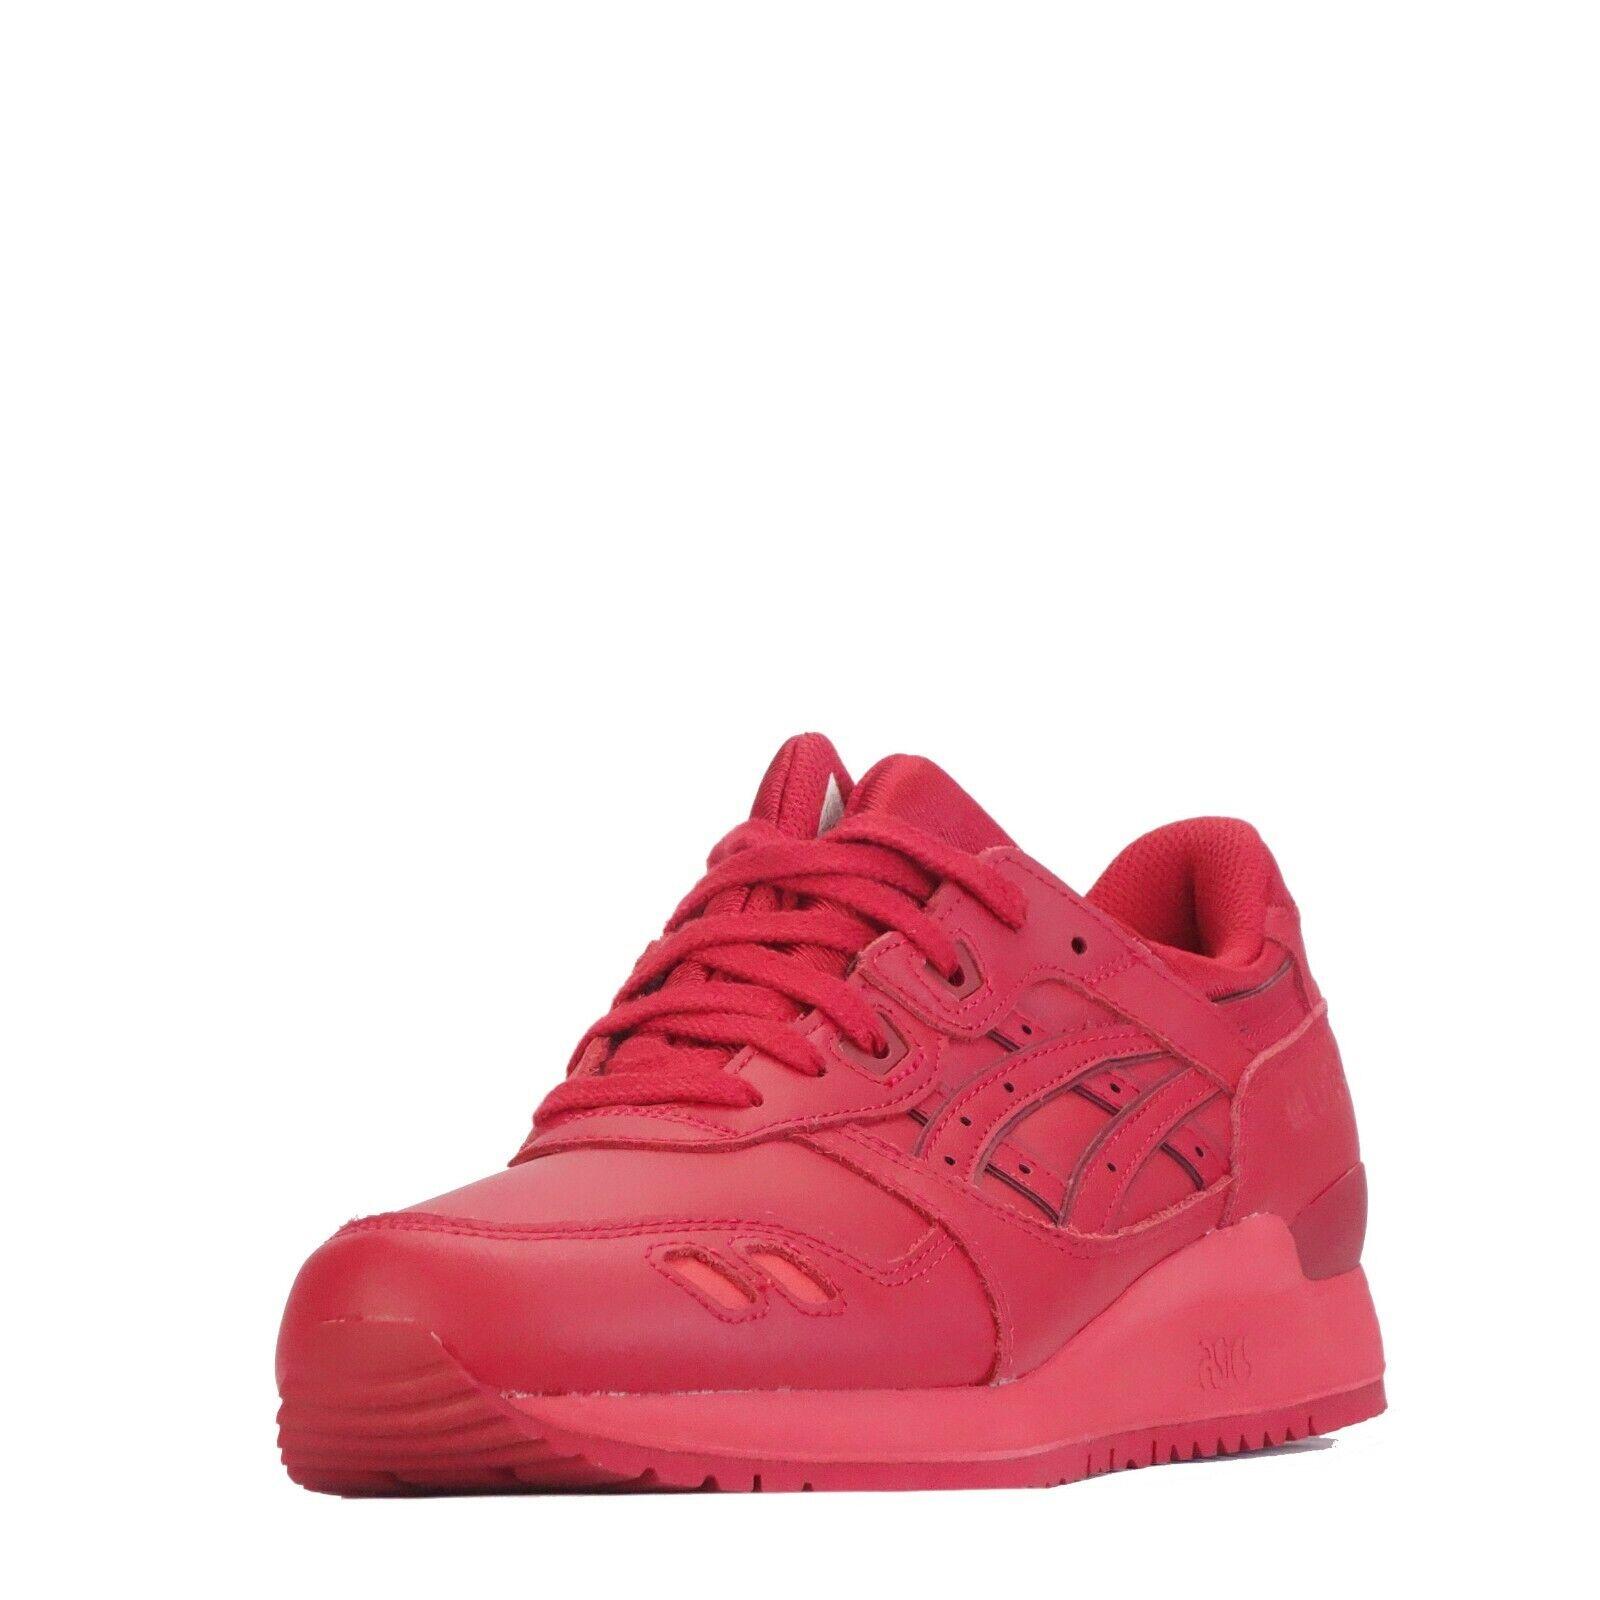 Asics Gel Lyte III Uomo 3 3 3 scarpe da ginnastica. Rosso Rosso baacbe